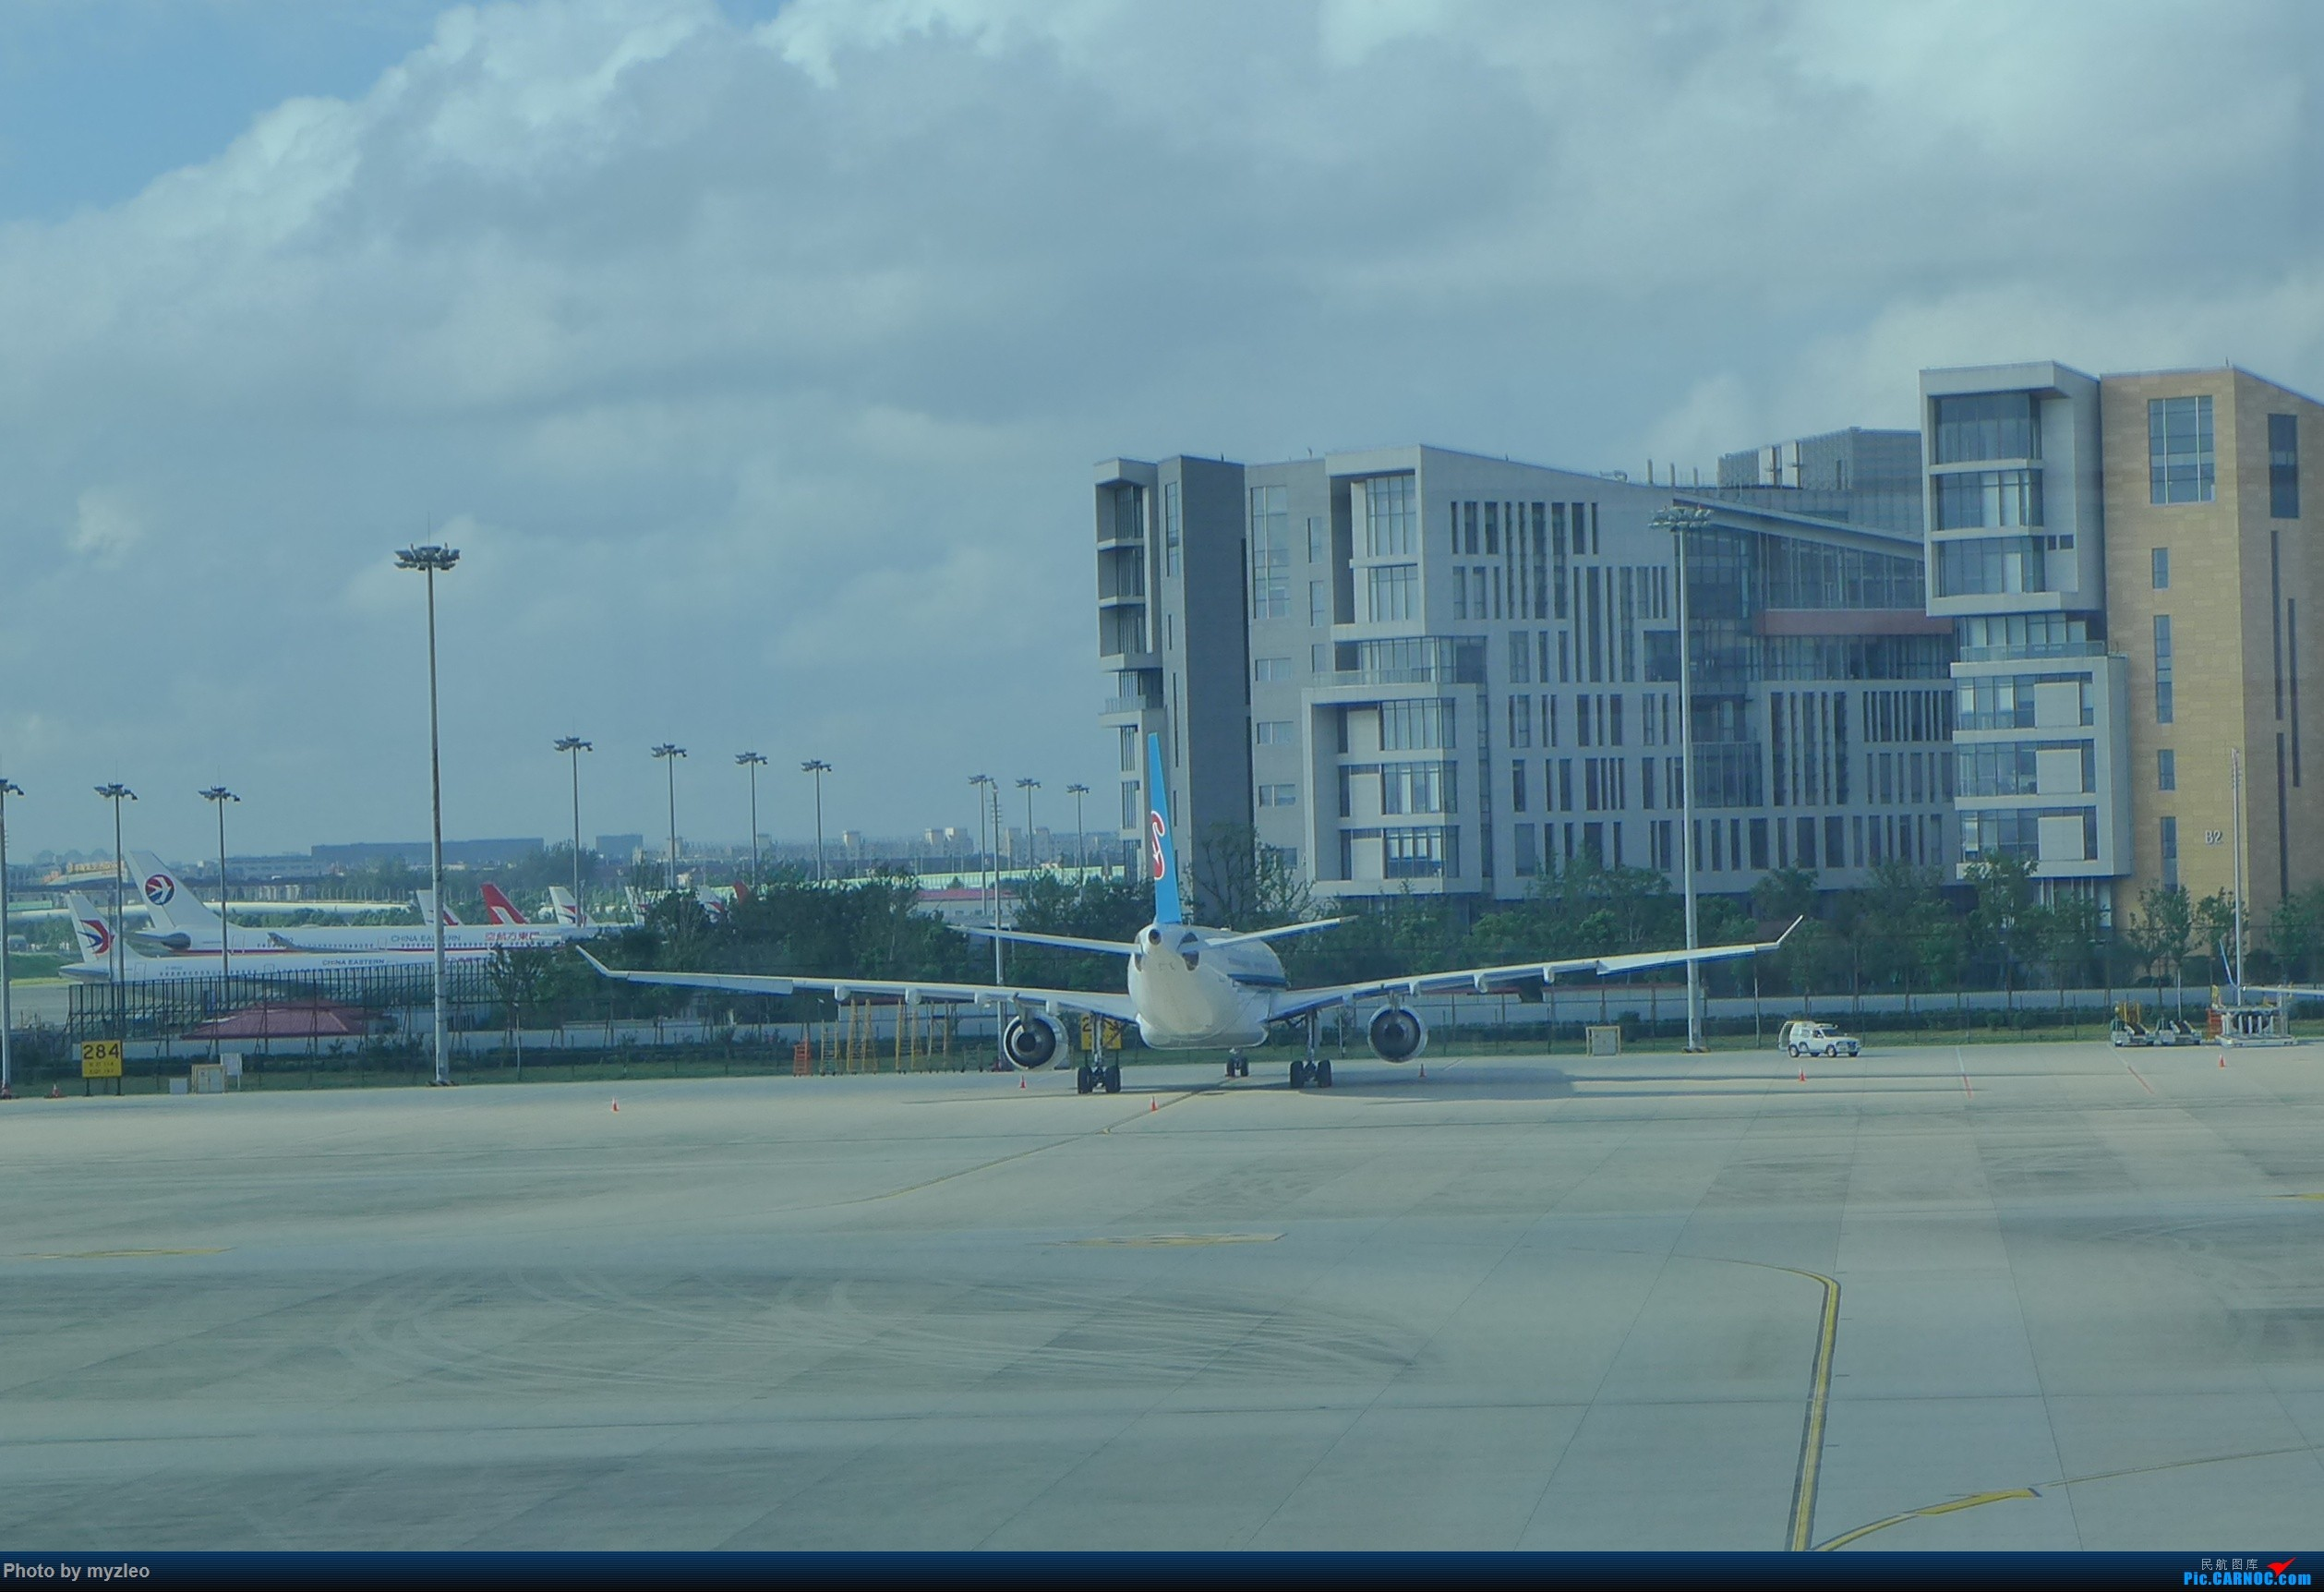 Re:[原创]【myzleo的游记3.1】三访帝都——记一次意外的惊喜,大鹅头初遇,第一次去中关村 AIRBUS A330  中国上海虹桥国际机场